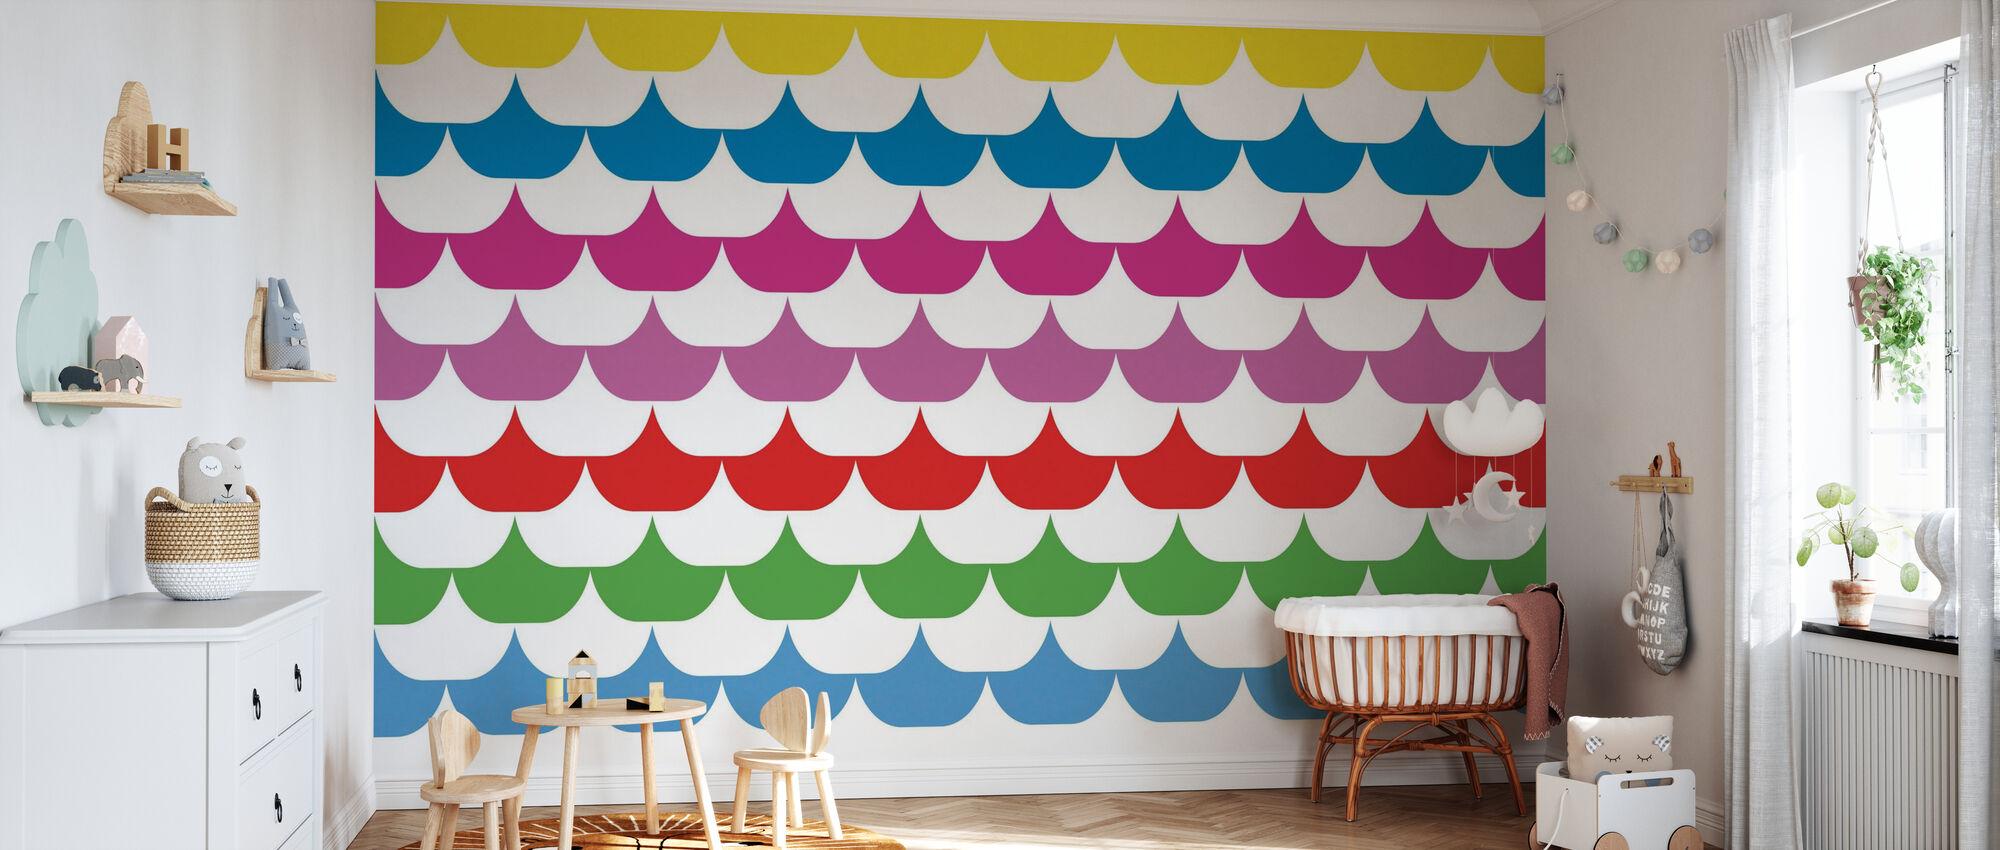 Coney Island - Wallpaper - Nursery